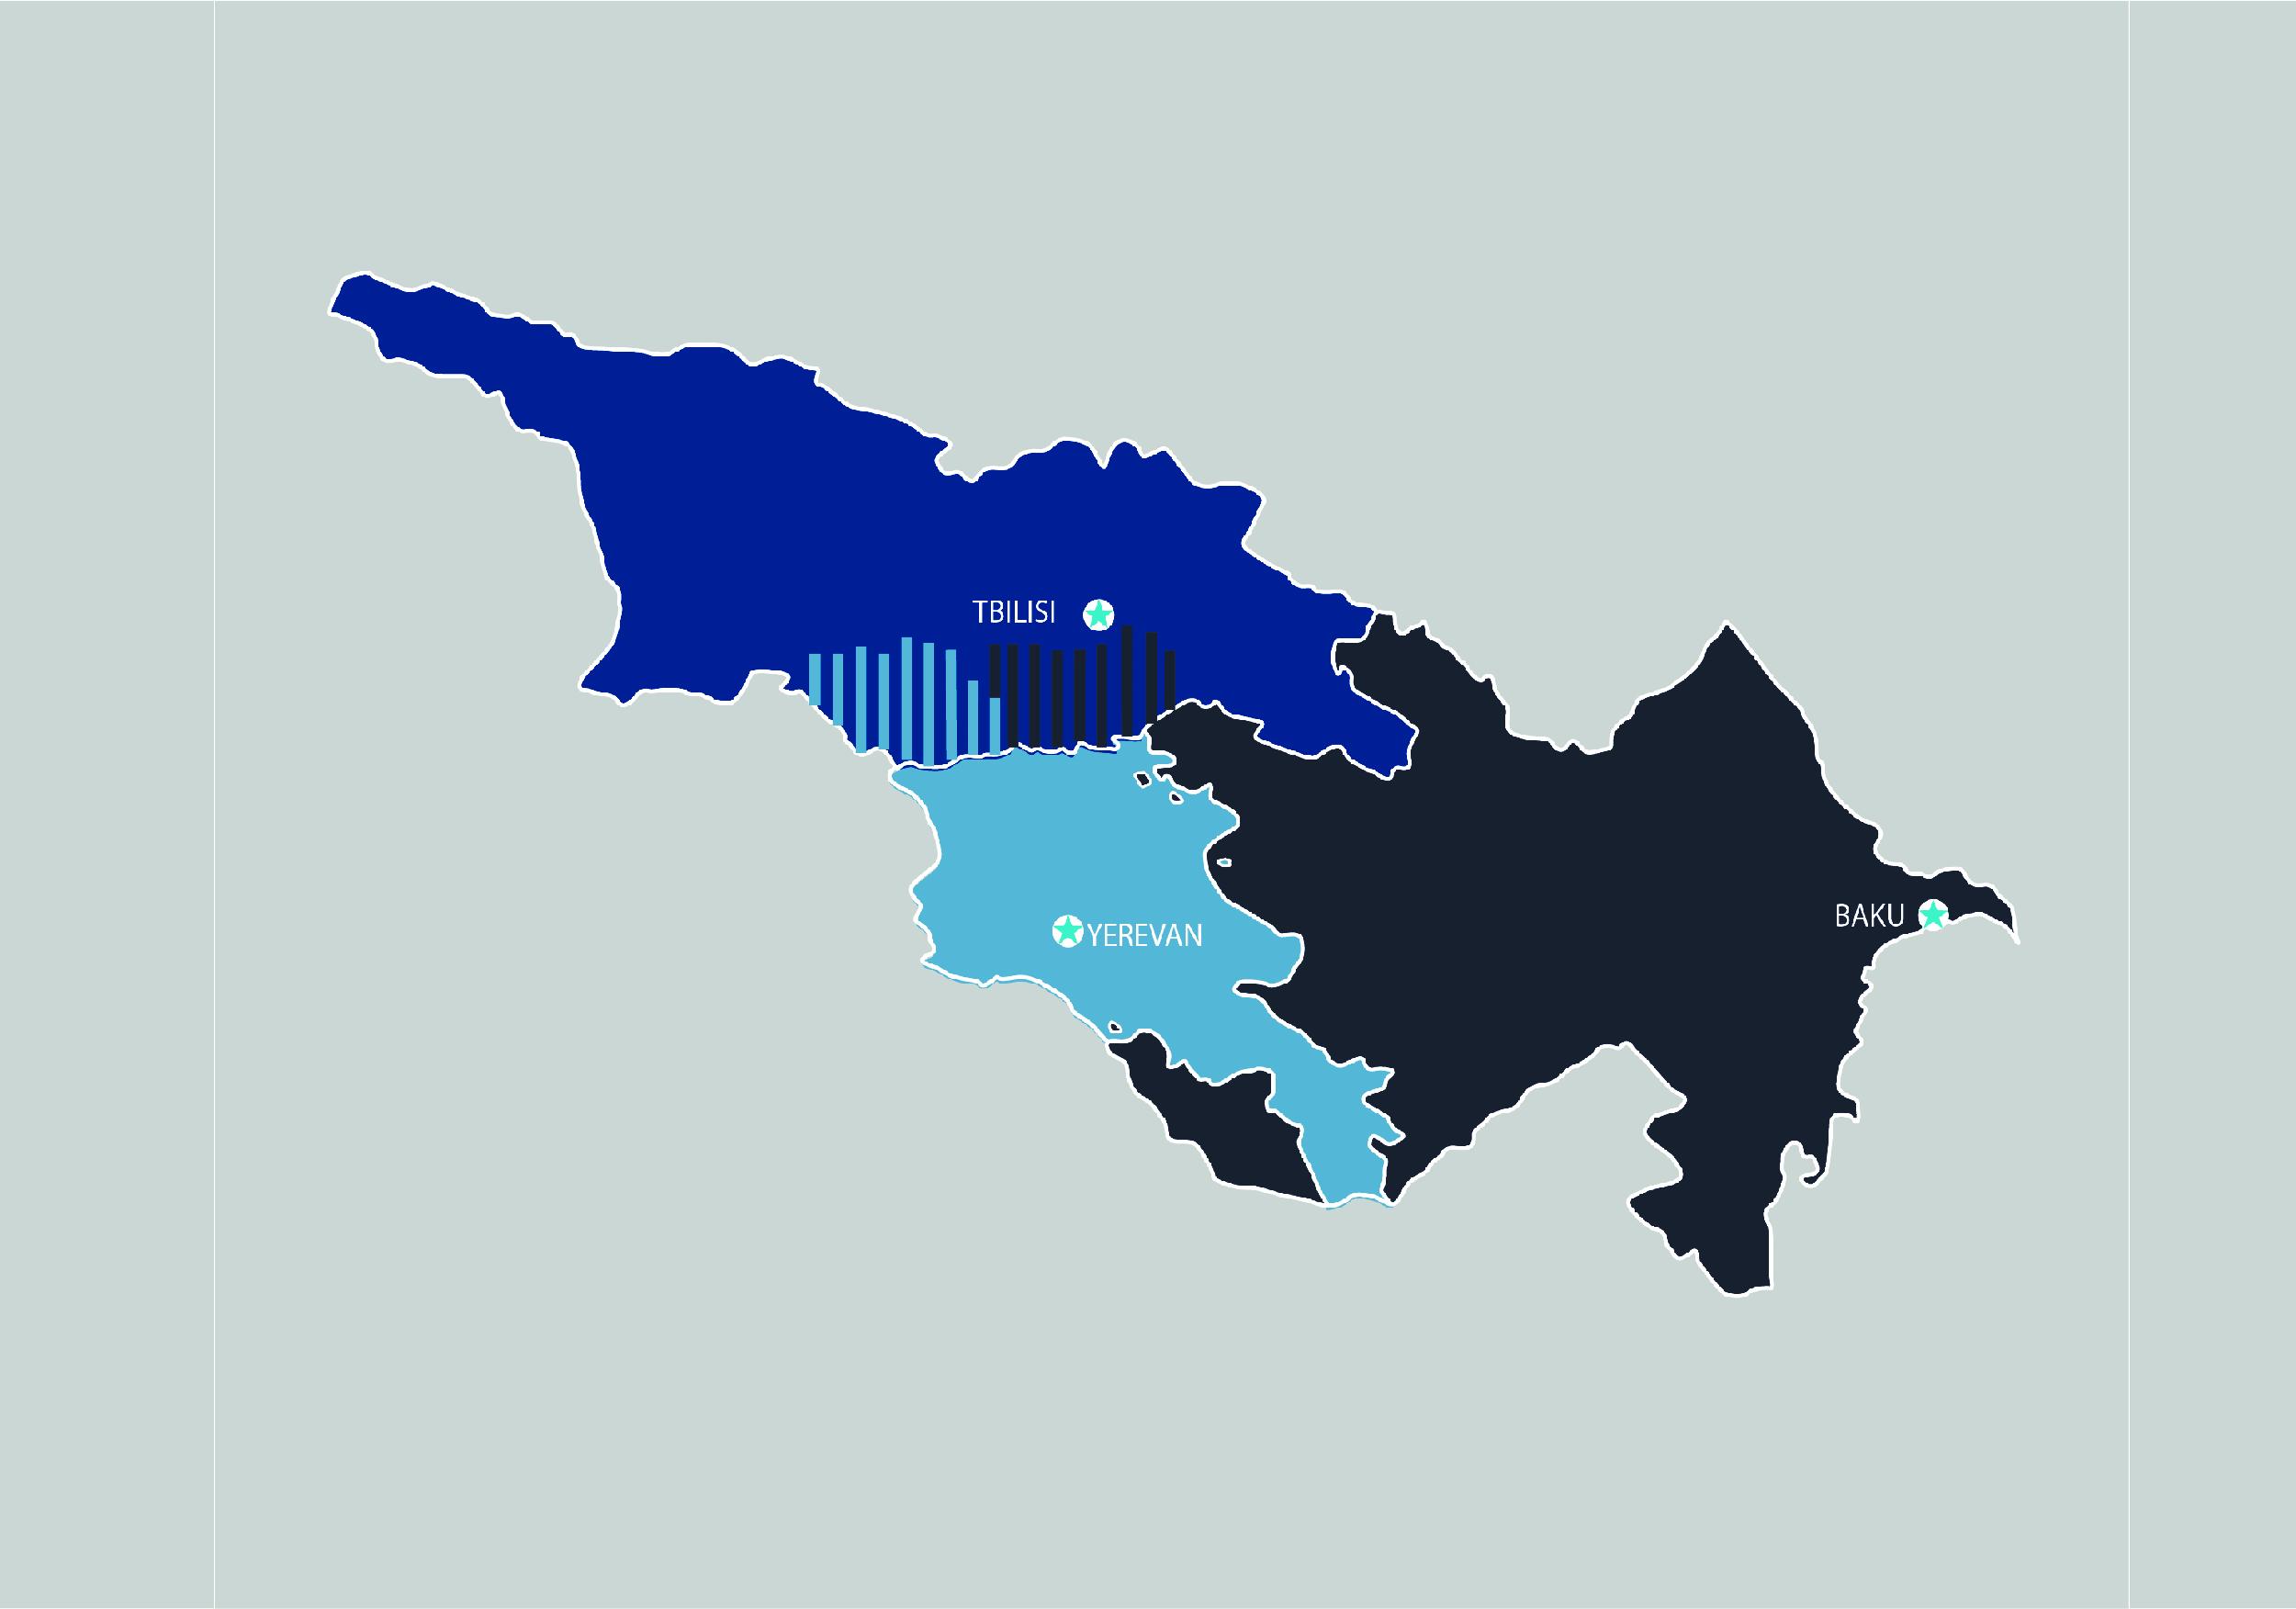 Armenia - Azerbaijan conflict and Georgia's perspective